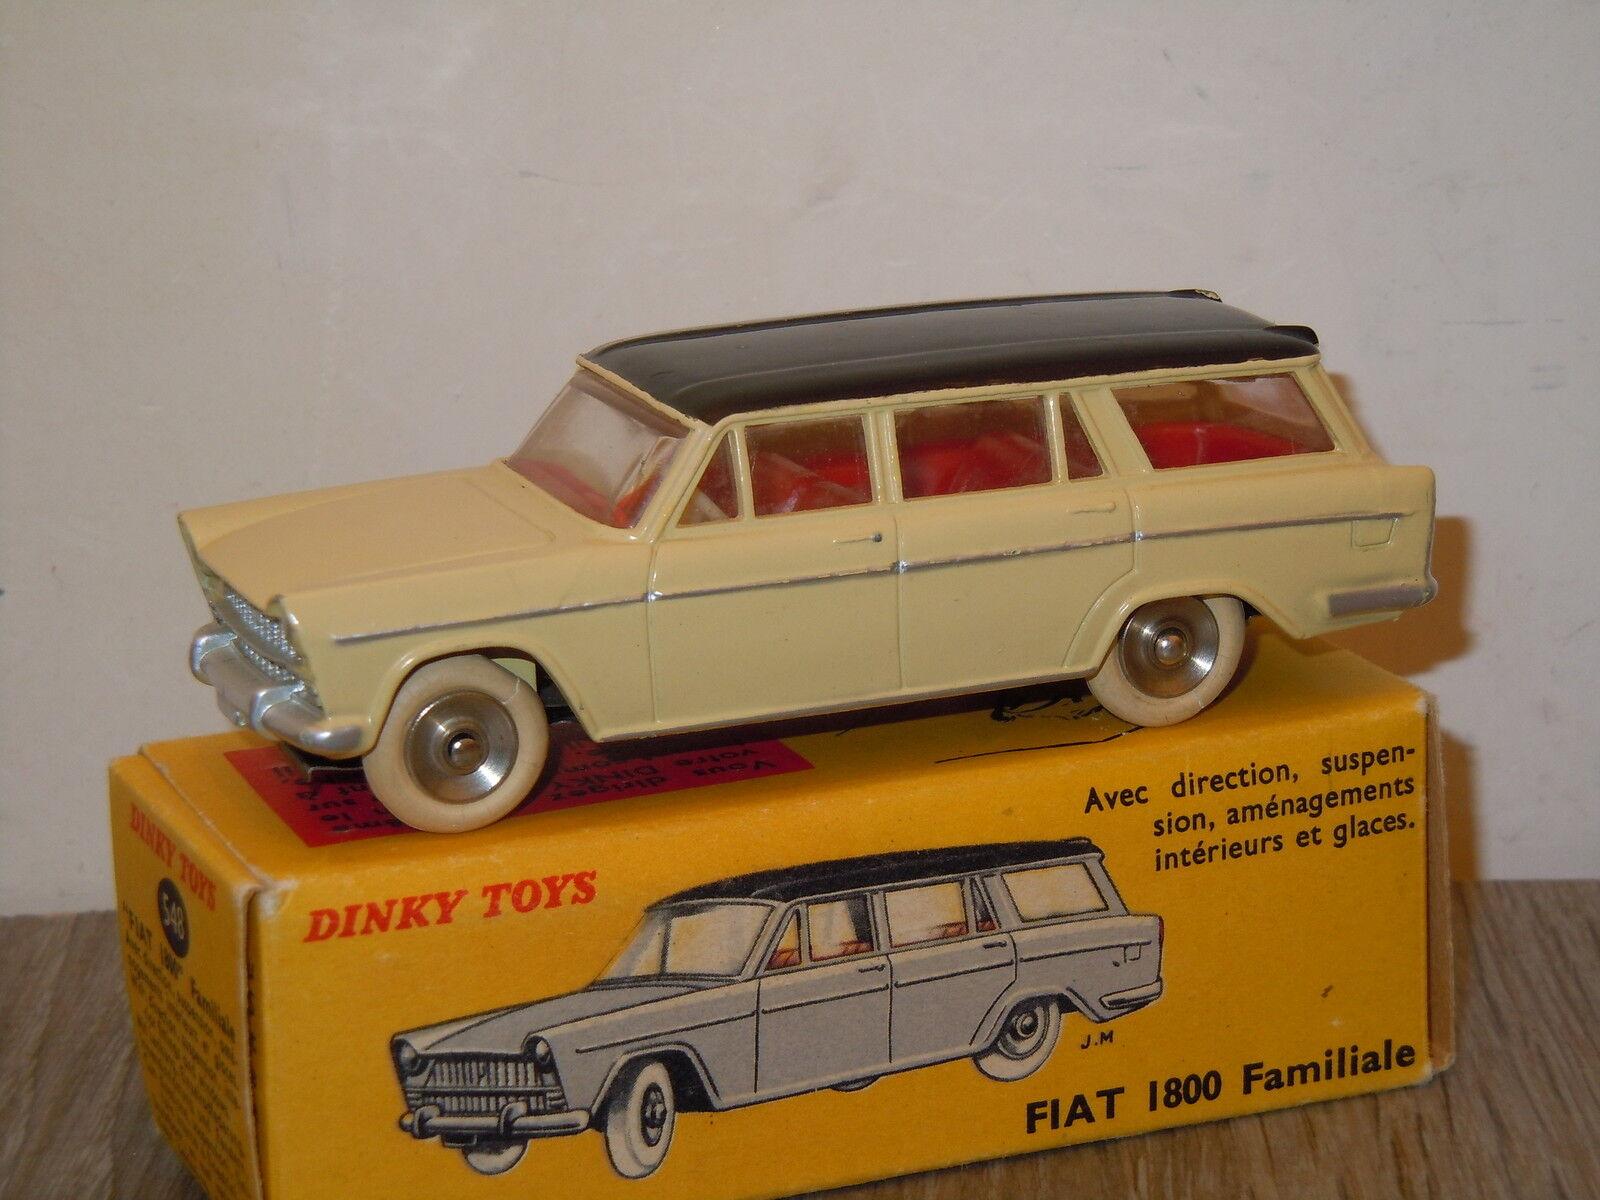 Fiat 1800 Familiale van Dinky Toys France 548 in Box 10137